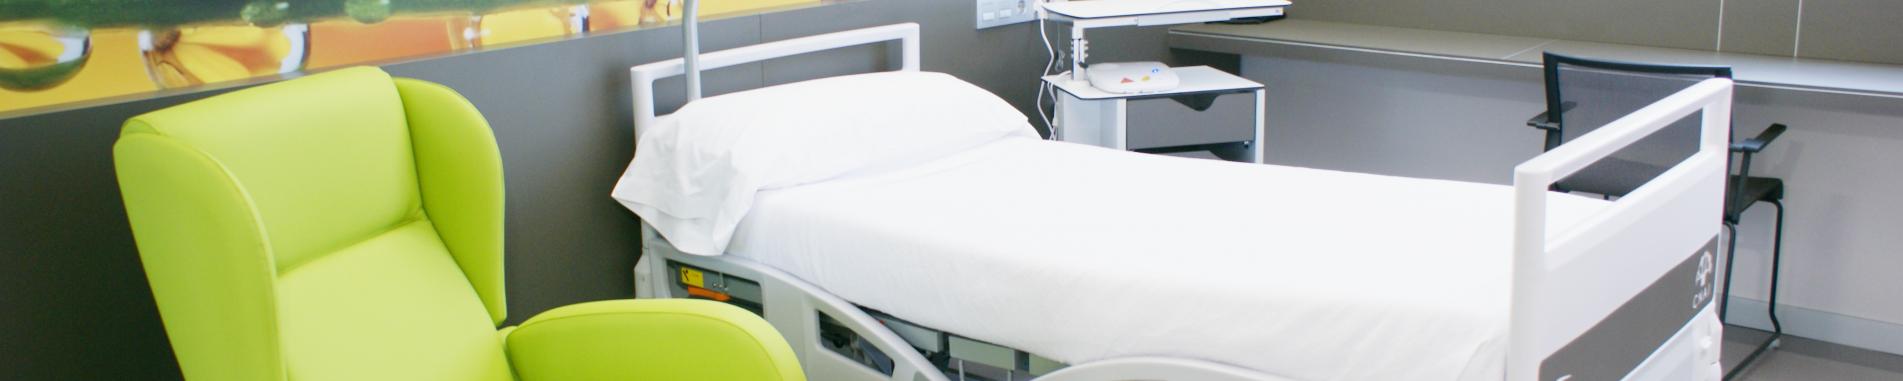 hospital cnai pamplona